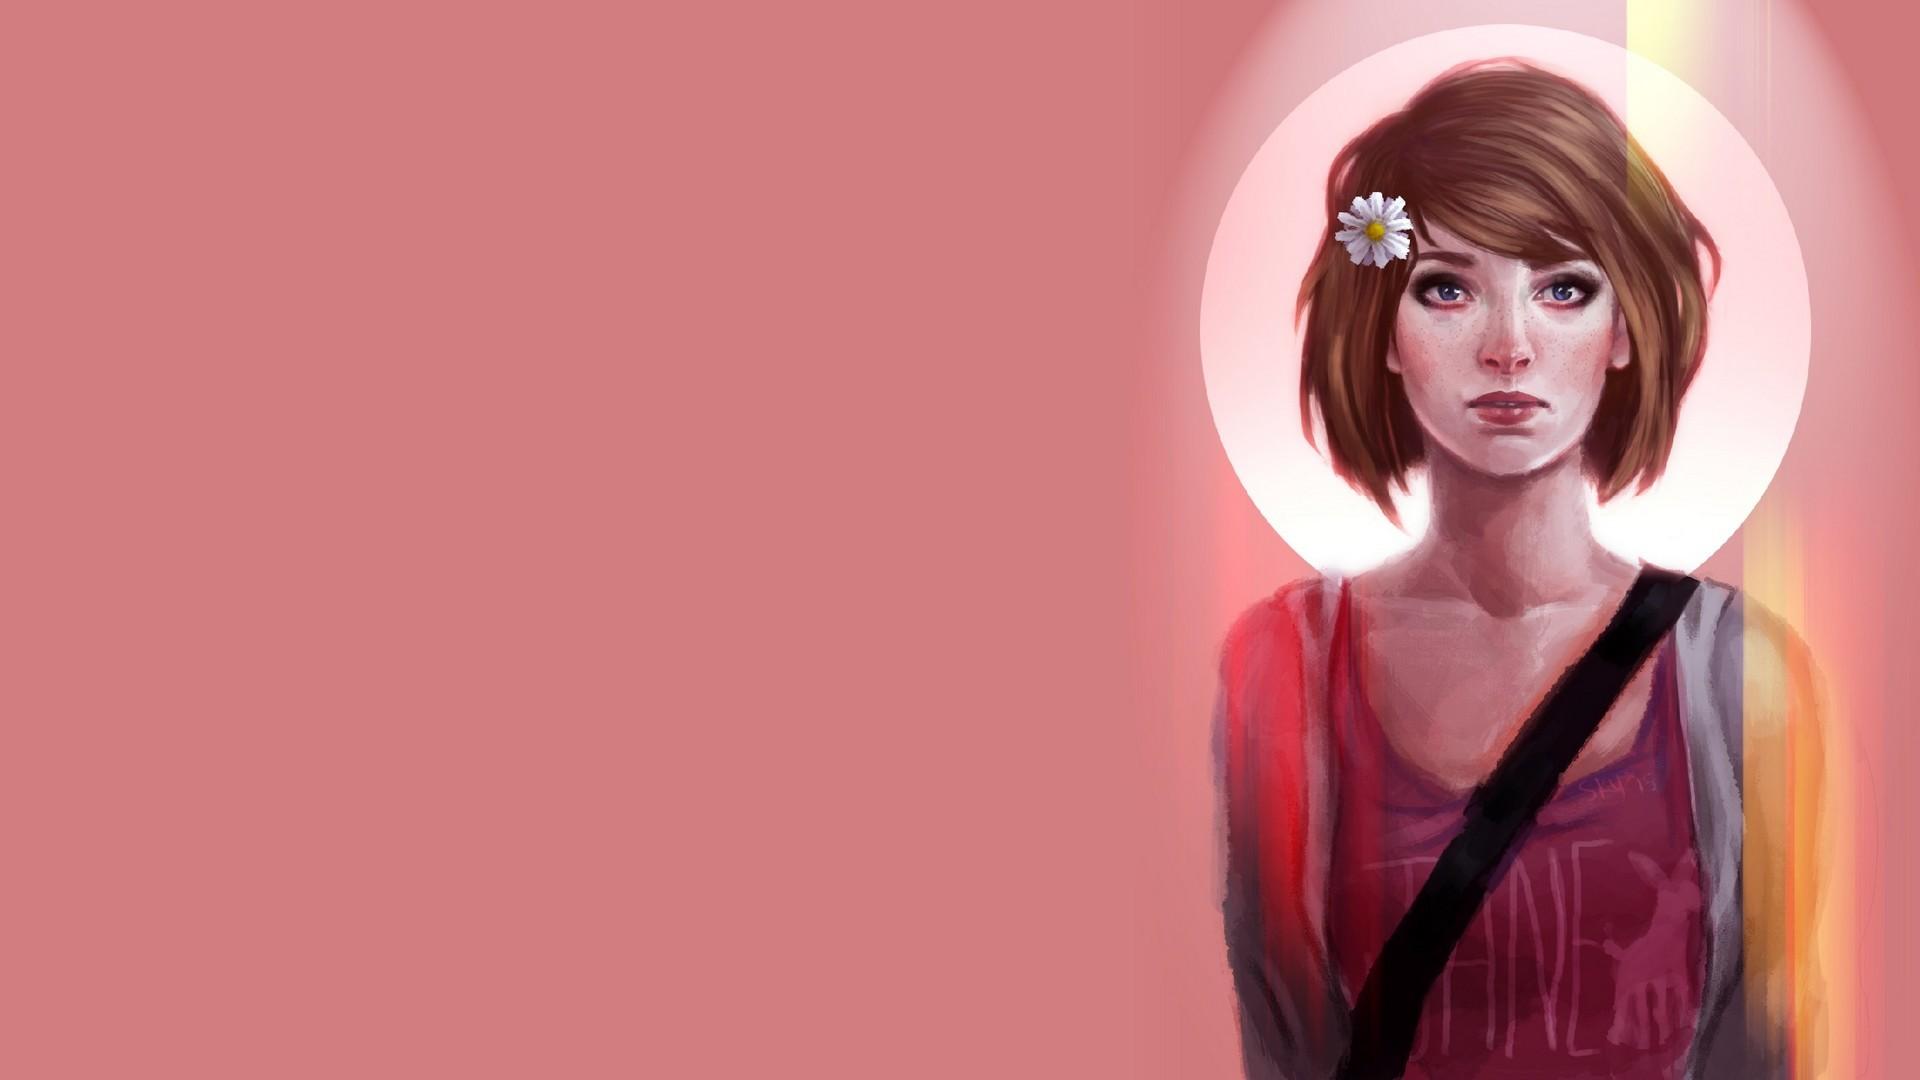 Video Game – Life Is Strange Max Caulfield Wallpaper